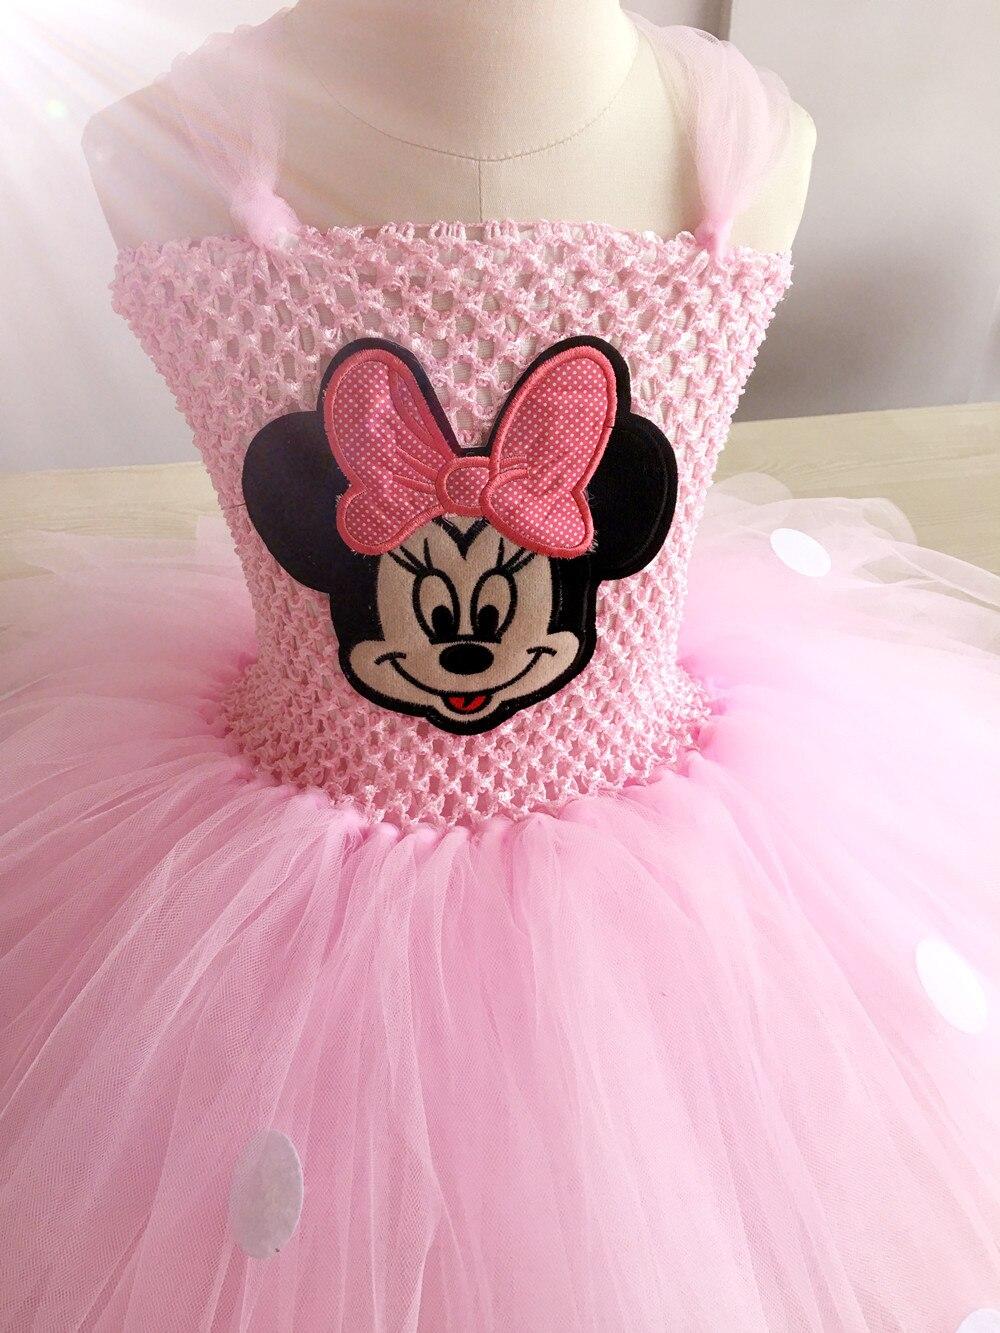 Minnie Mouse Dress Girl Kids Minnie Cartoon Cosplay Knee Length Tutu ...